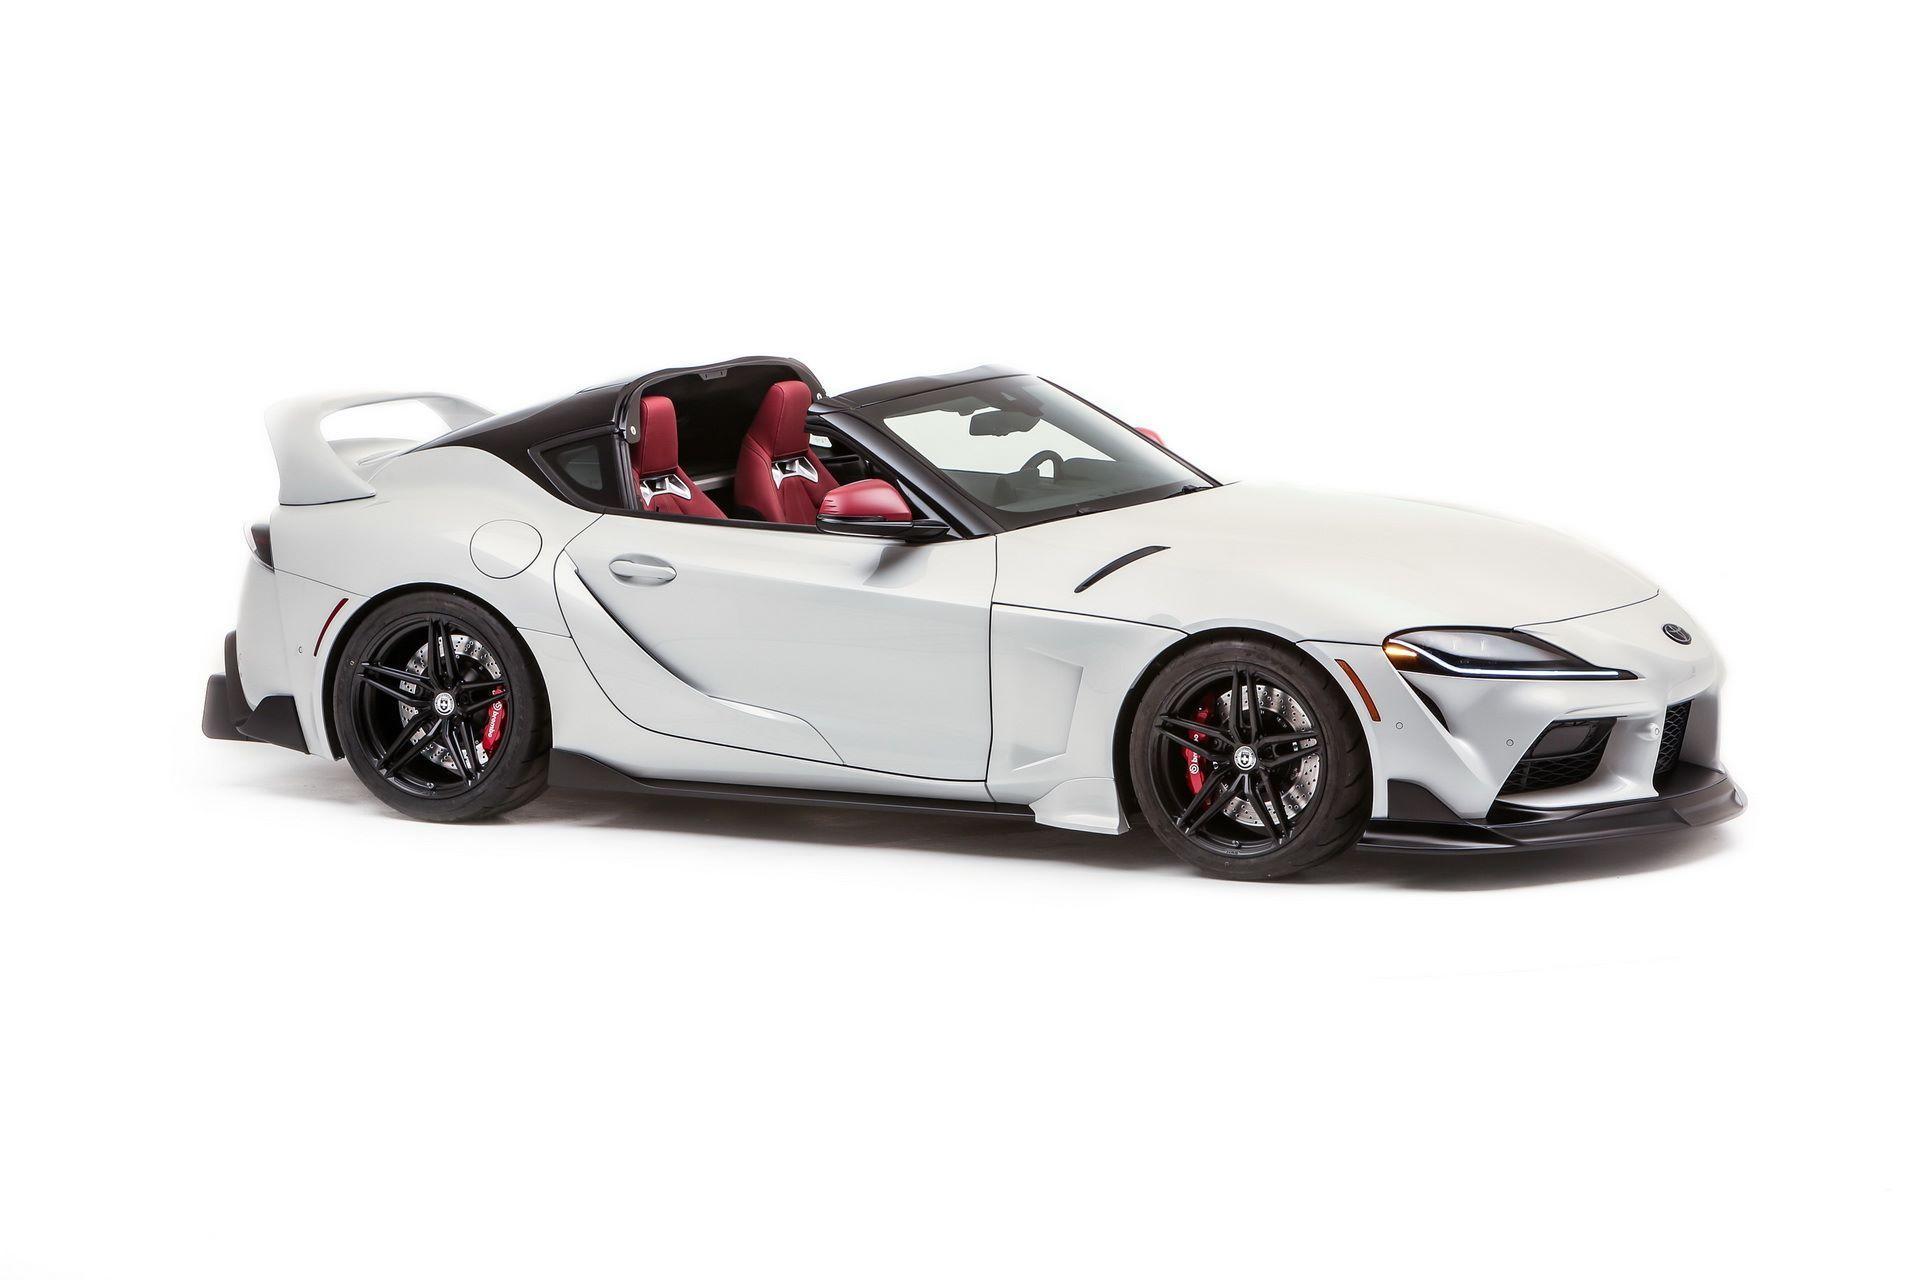 toyota-sema-2020-new-cars-12